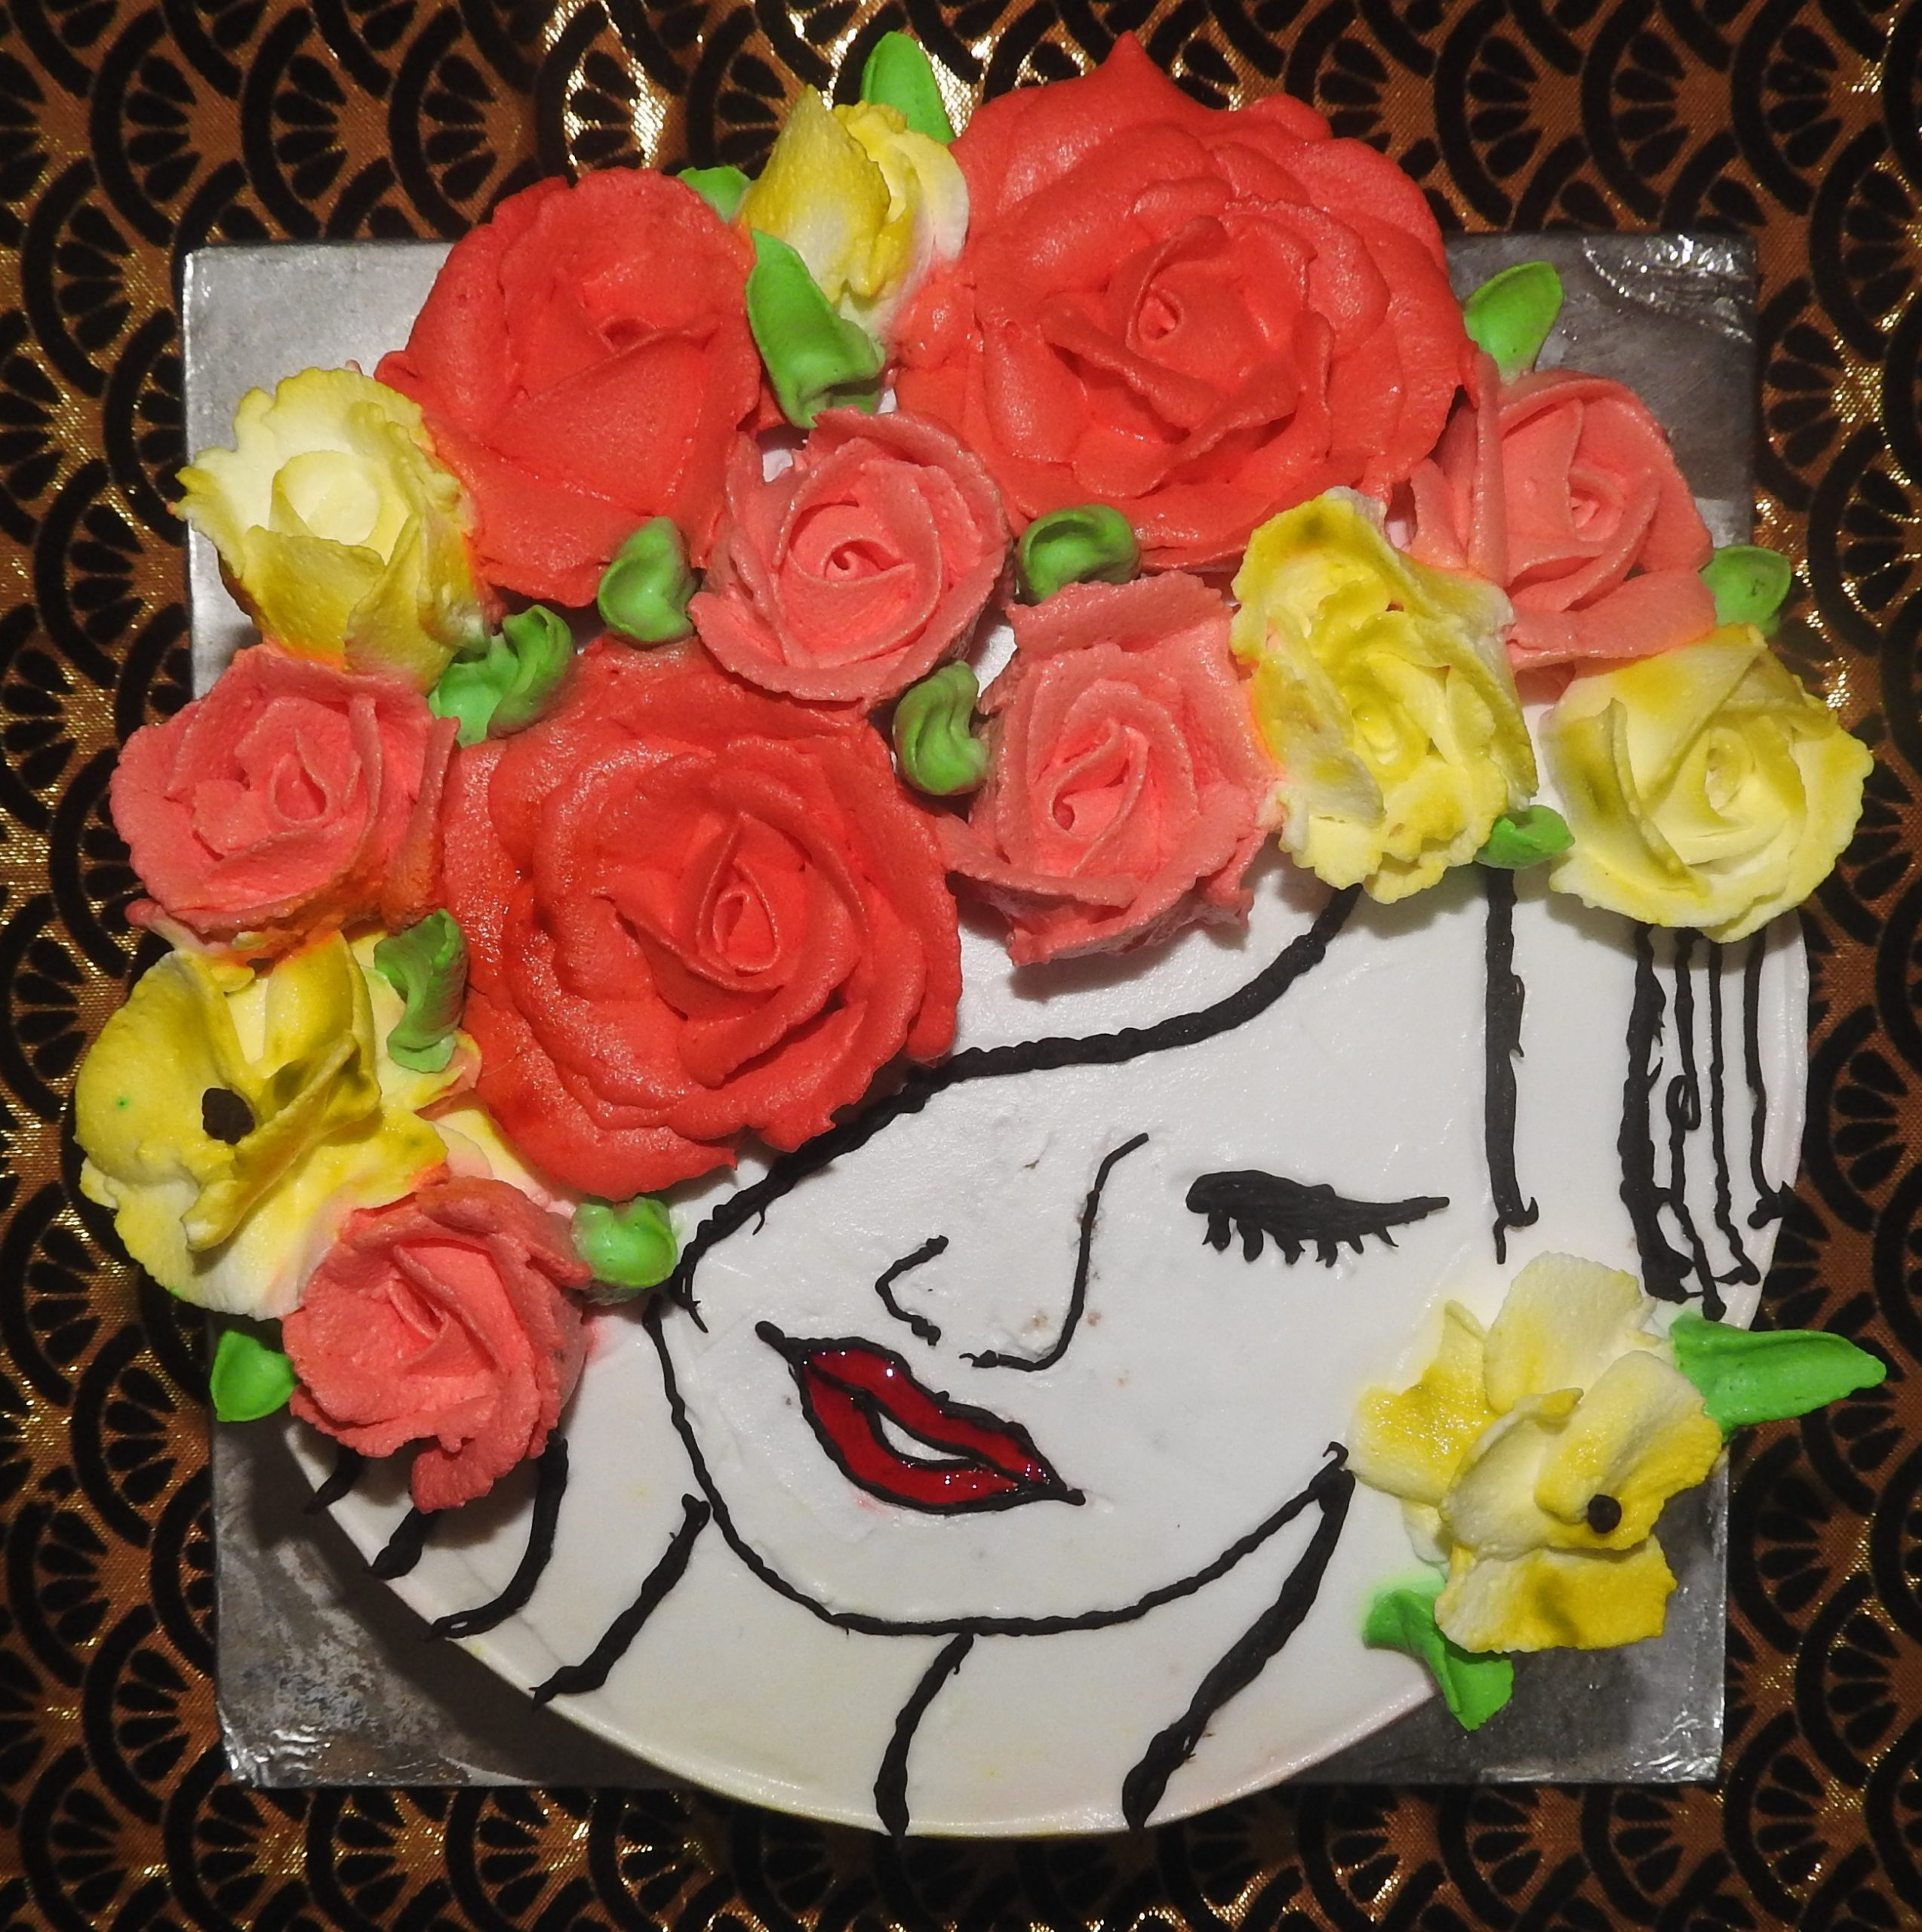 Designed Birthday Cake